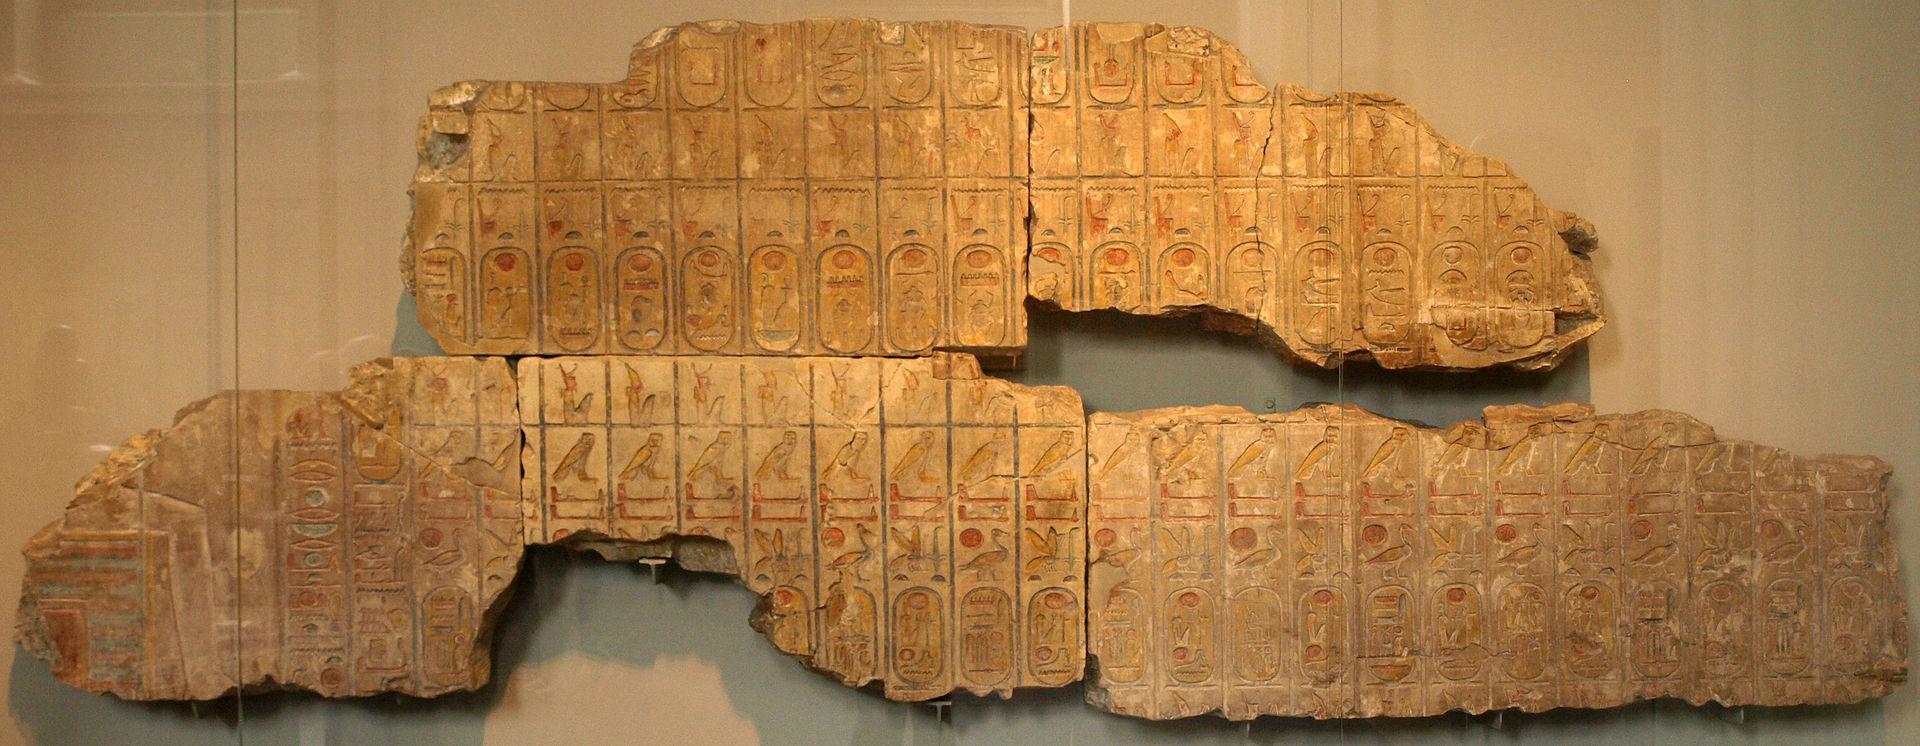 Abydos Ramses  Fr Ef Bf Bdsques Prisonniers Noms Villes